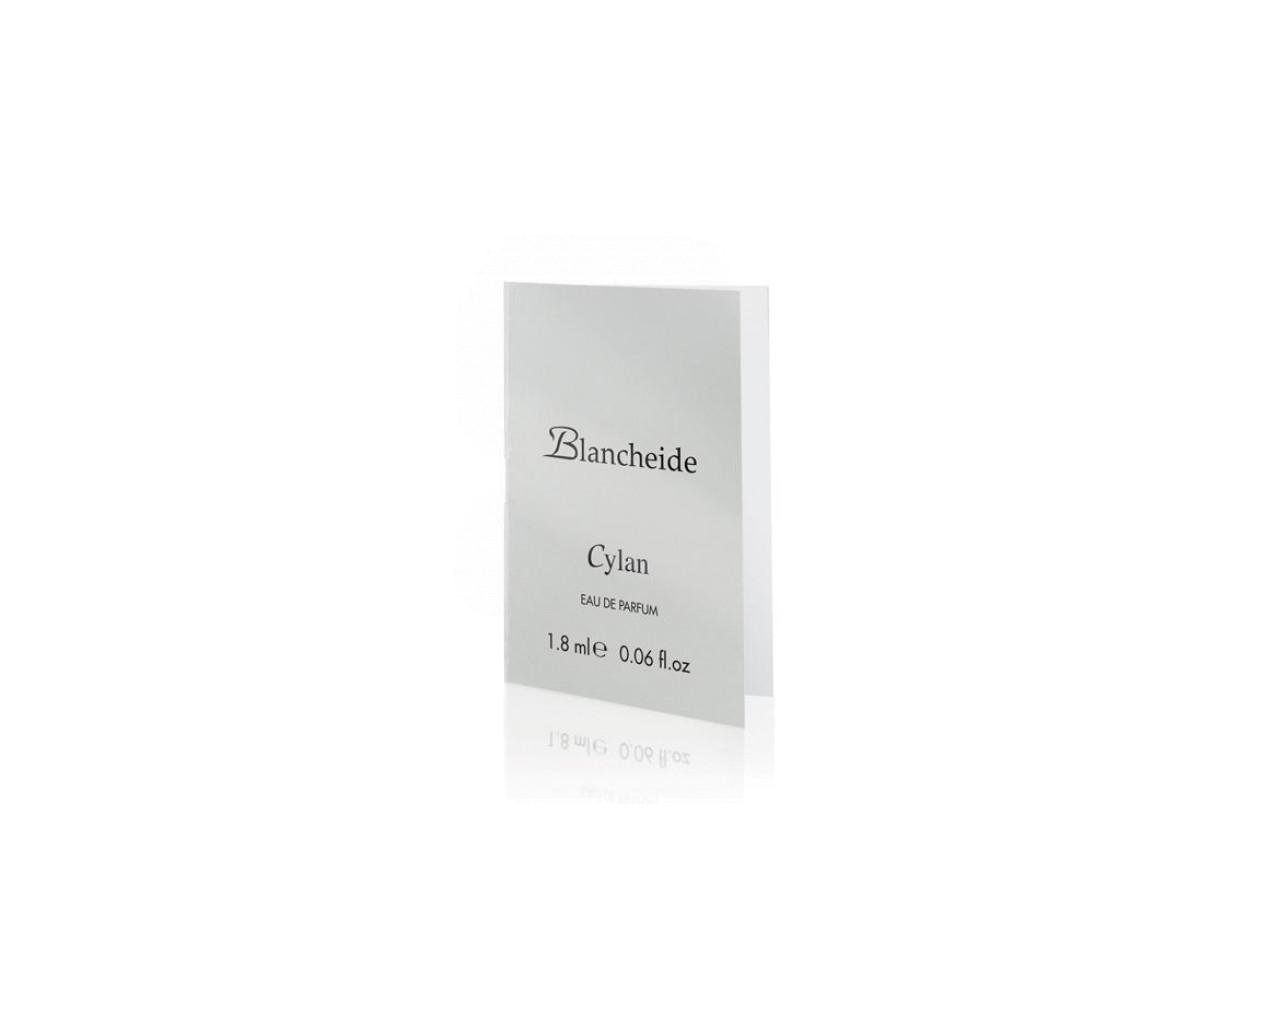 Campioncino Cylan Blancheide EDP 1,8 ml Blancheide BLAS001CY-02